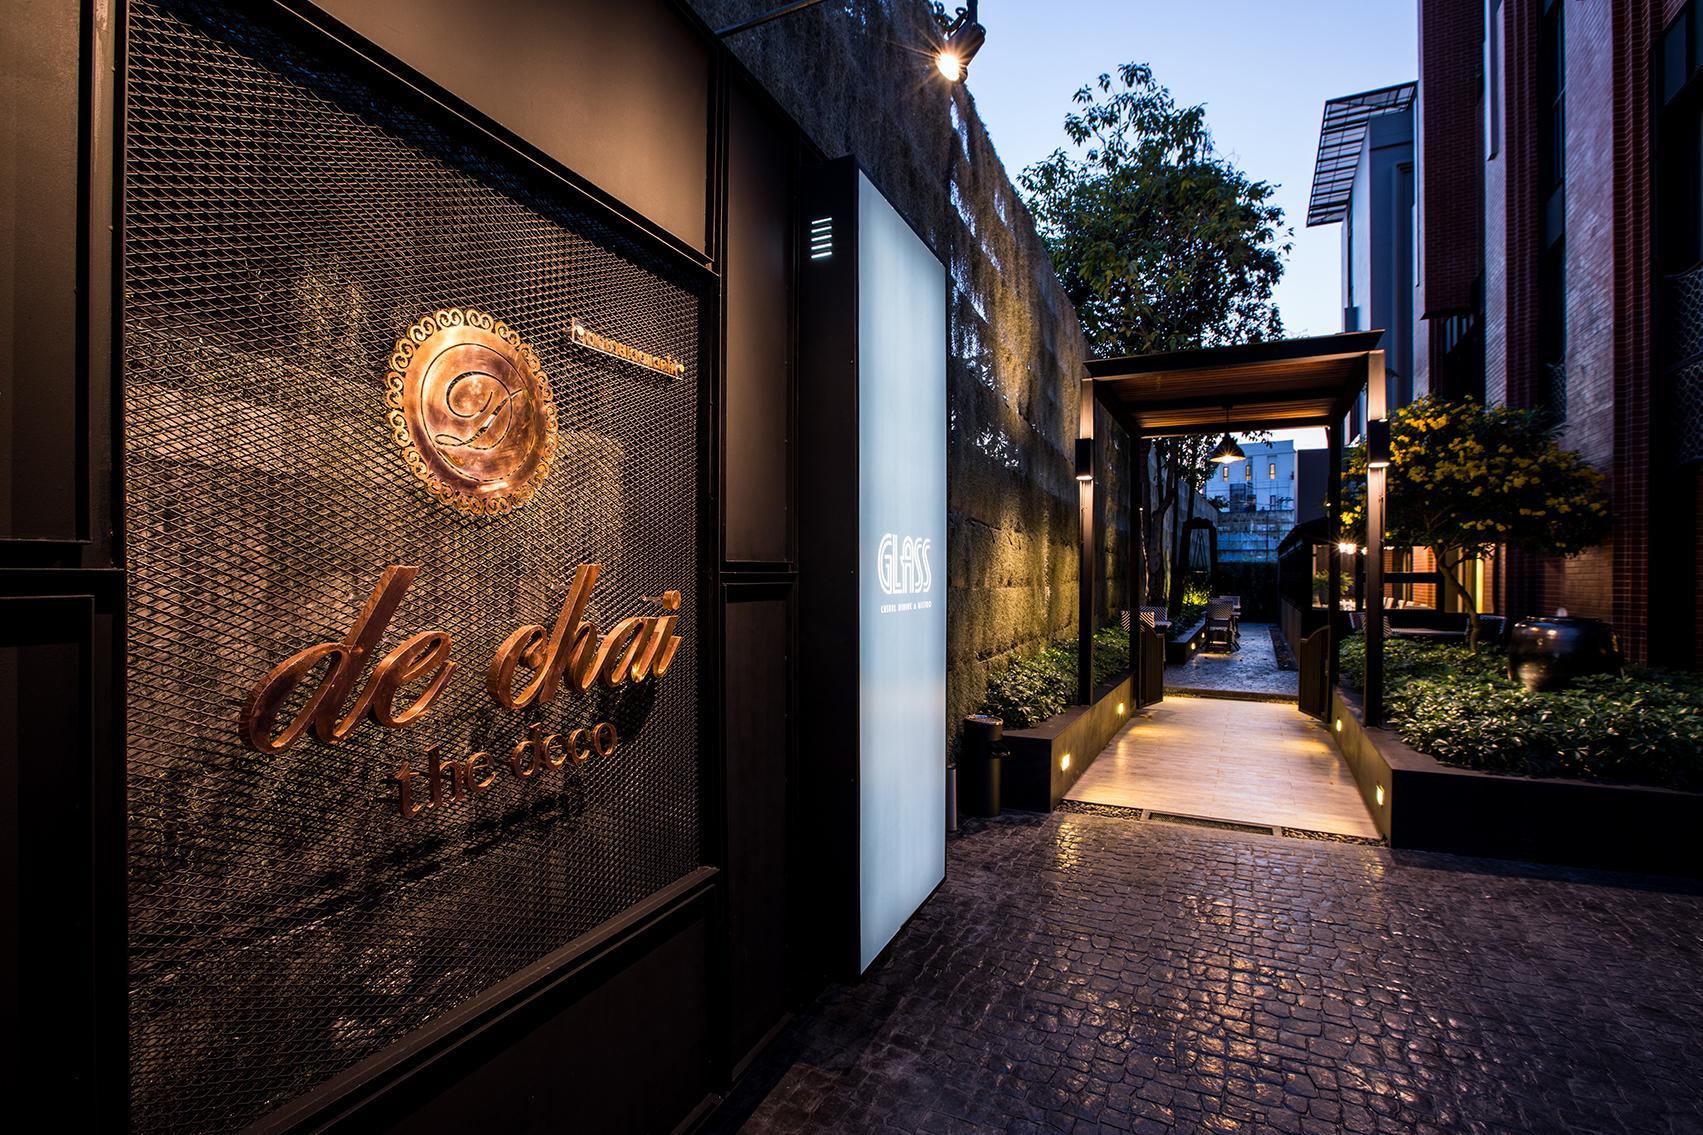 De chai the deco hotel chiang mai boek een aanbieding op agoda